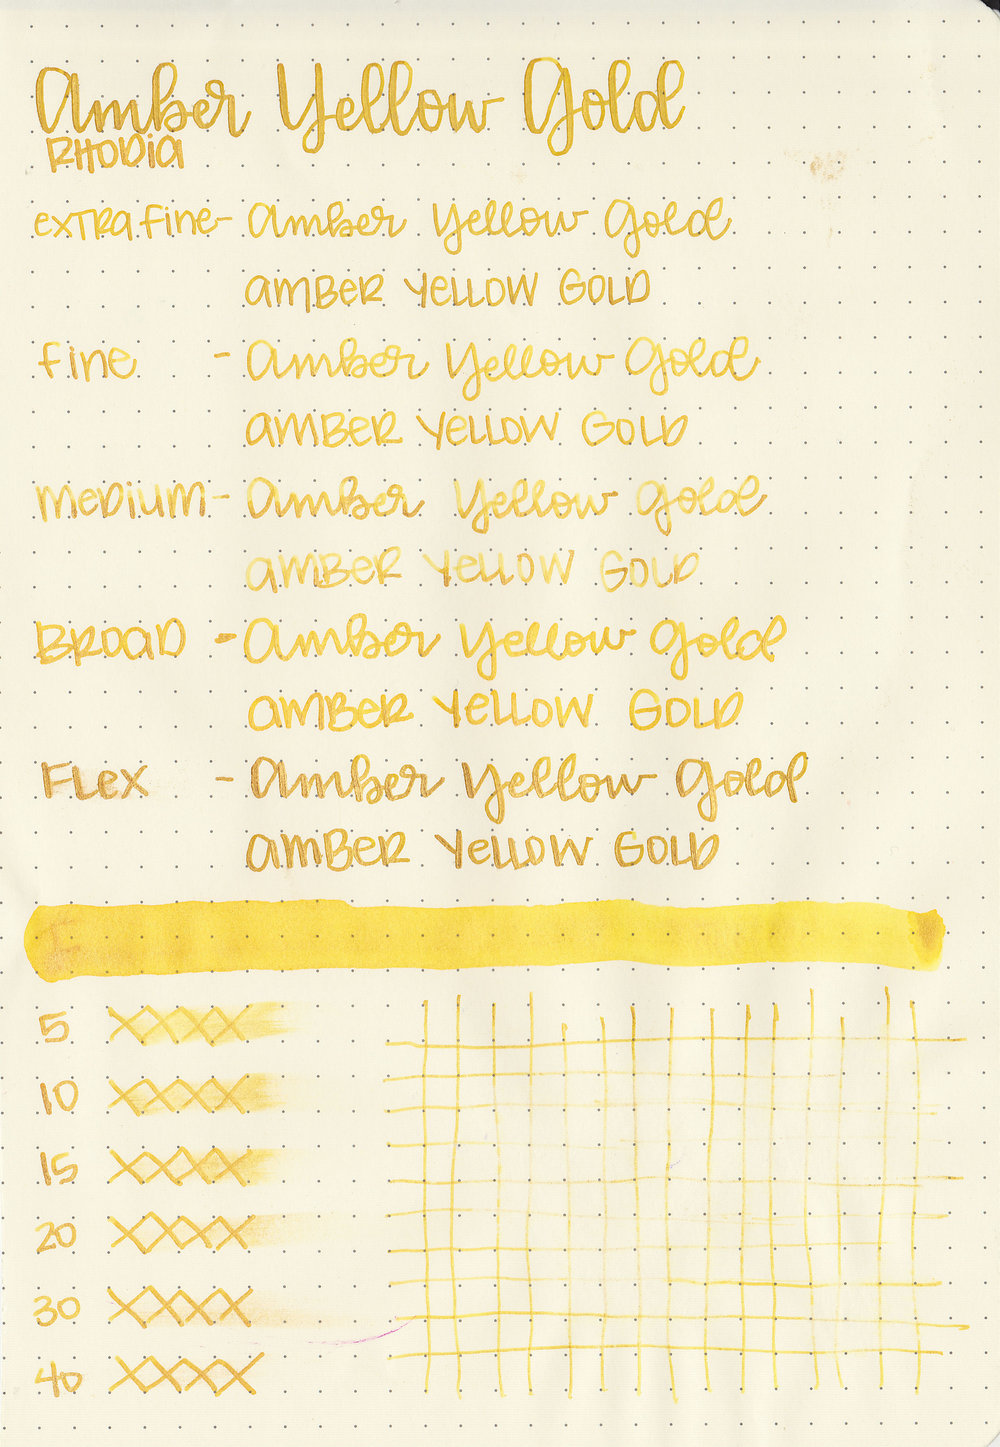 da-amber-yellow-8.jpg